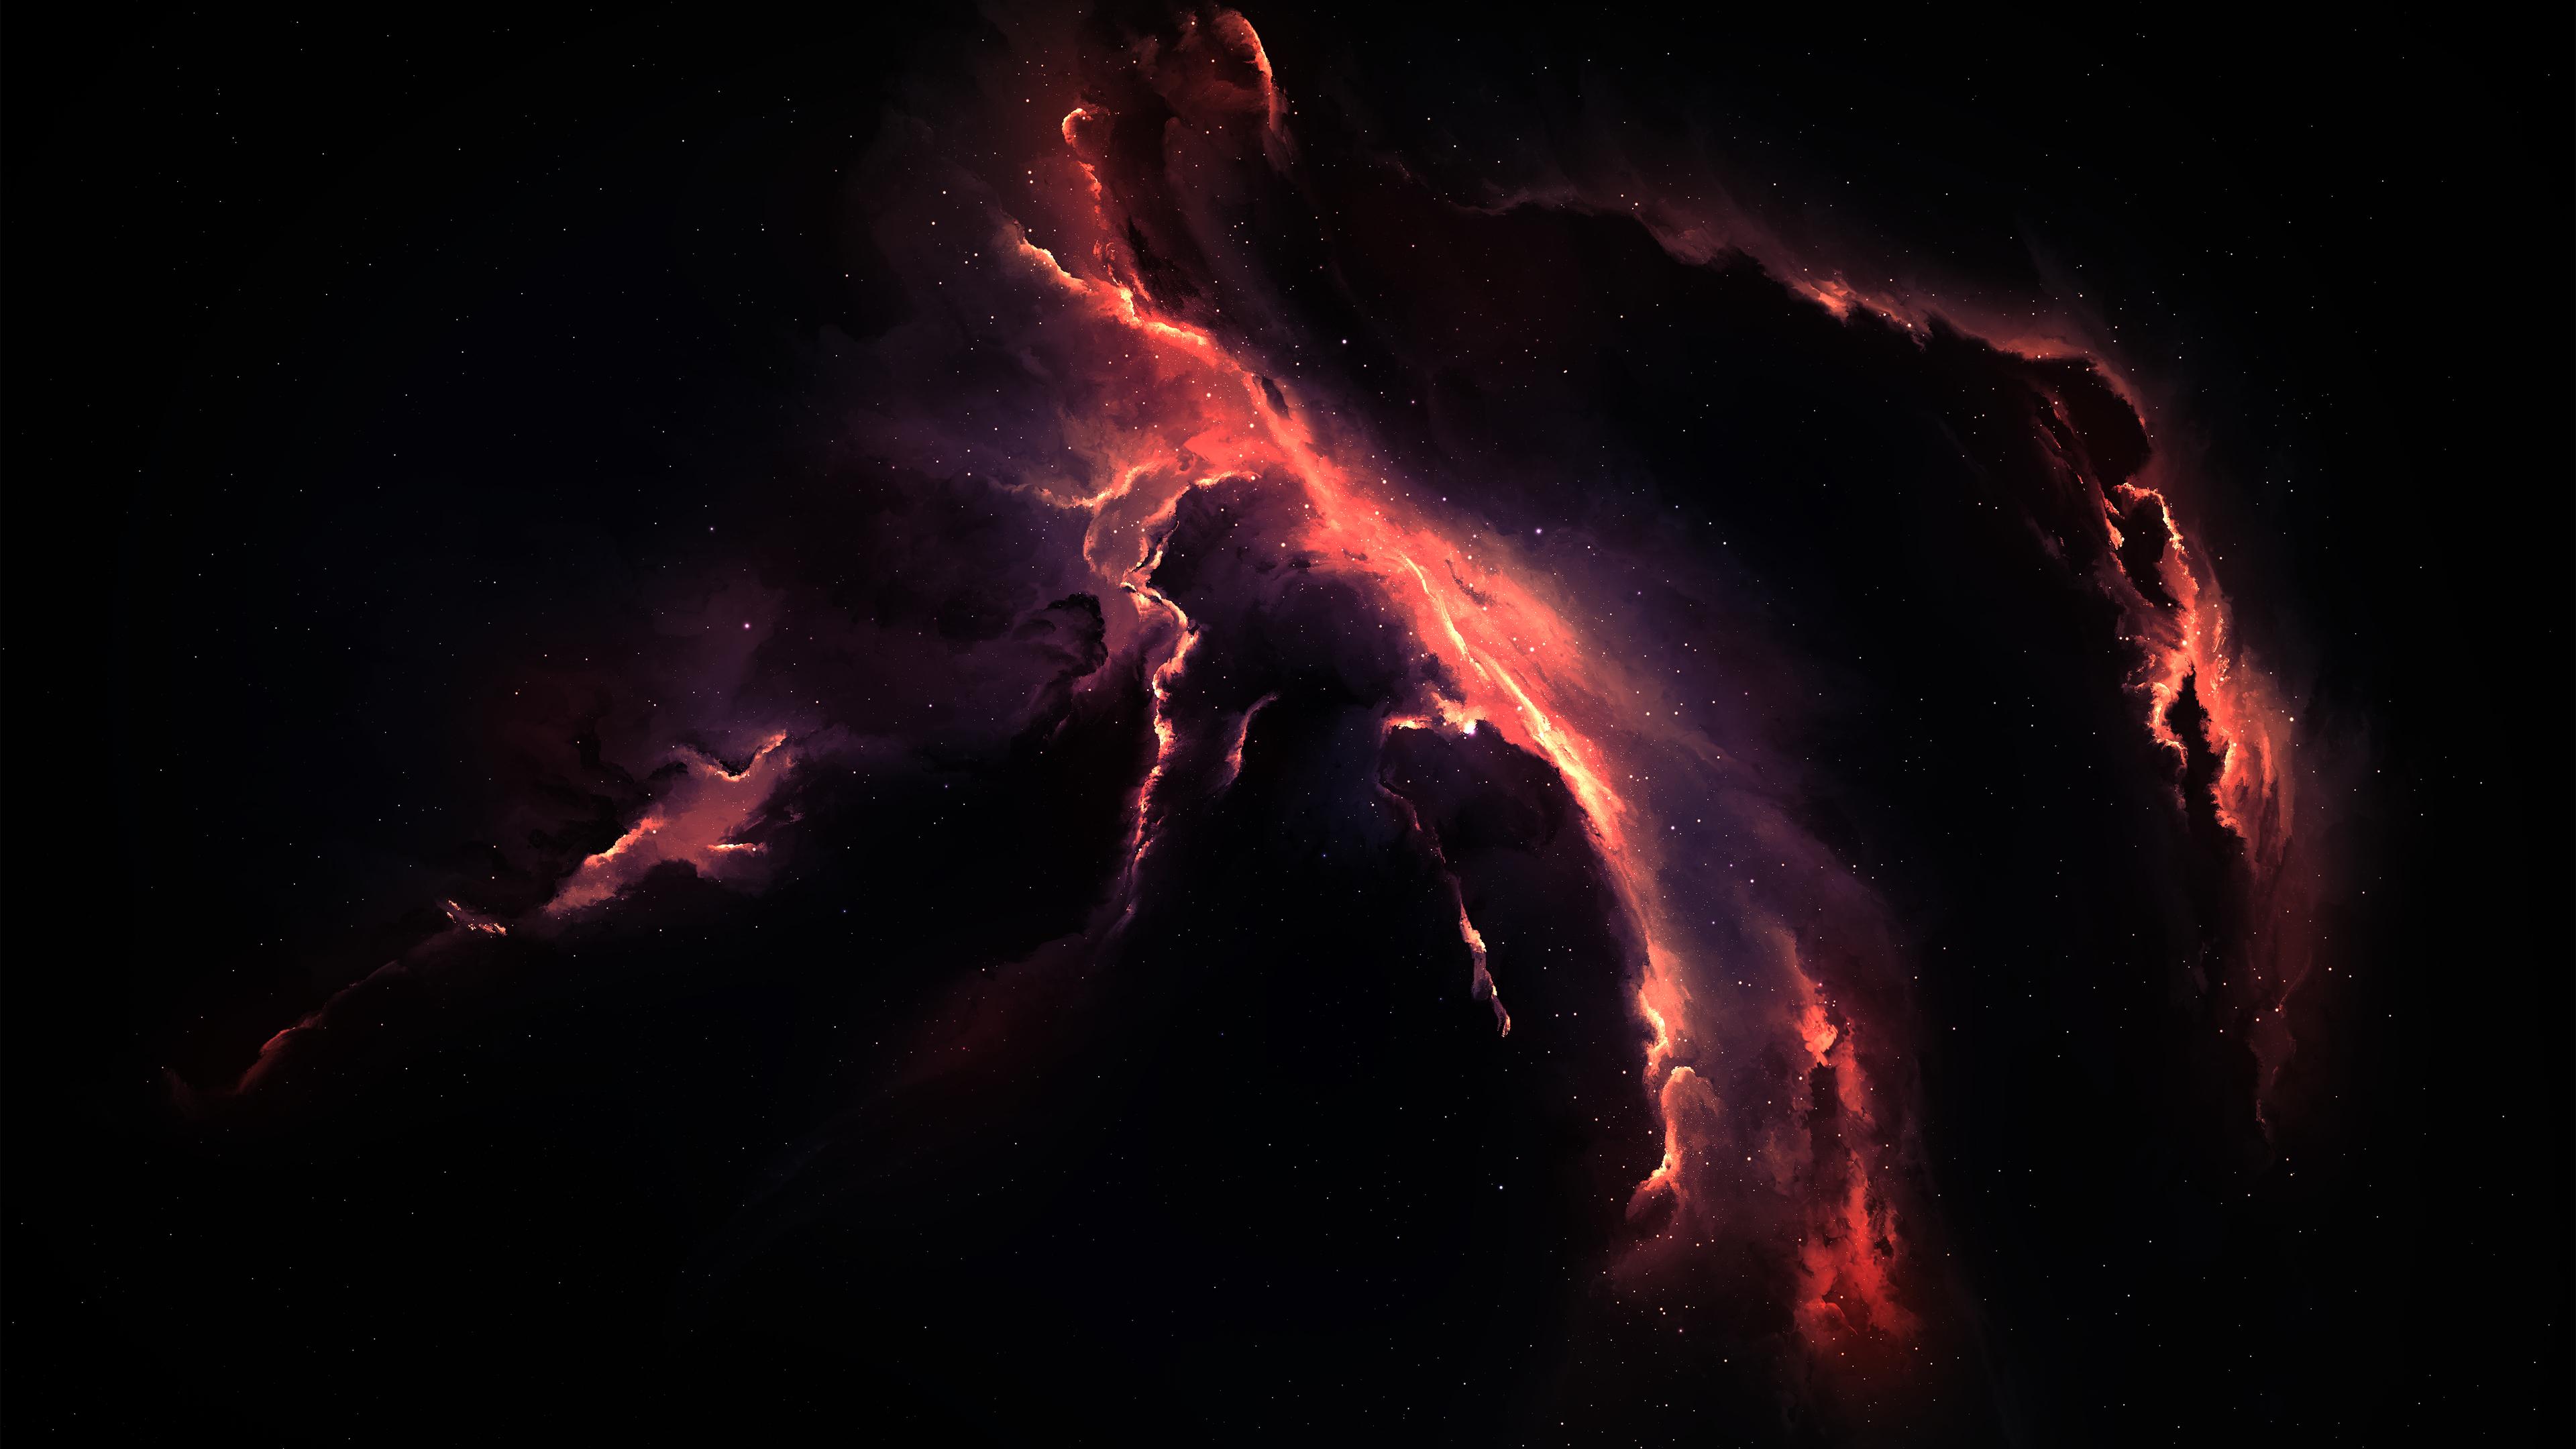 nebula scenery cosmos 4k 1546279218 - Nebula Scenery Cosmos 4k - nebula wallpapers, hd-wallpapers, digital universe wallpapers, deviantart wallpapers, 5k wallpapers, 4k-wallpapers